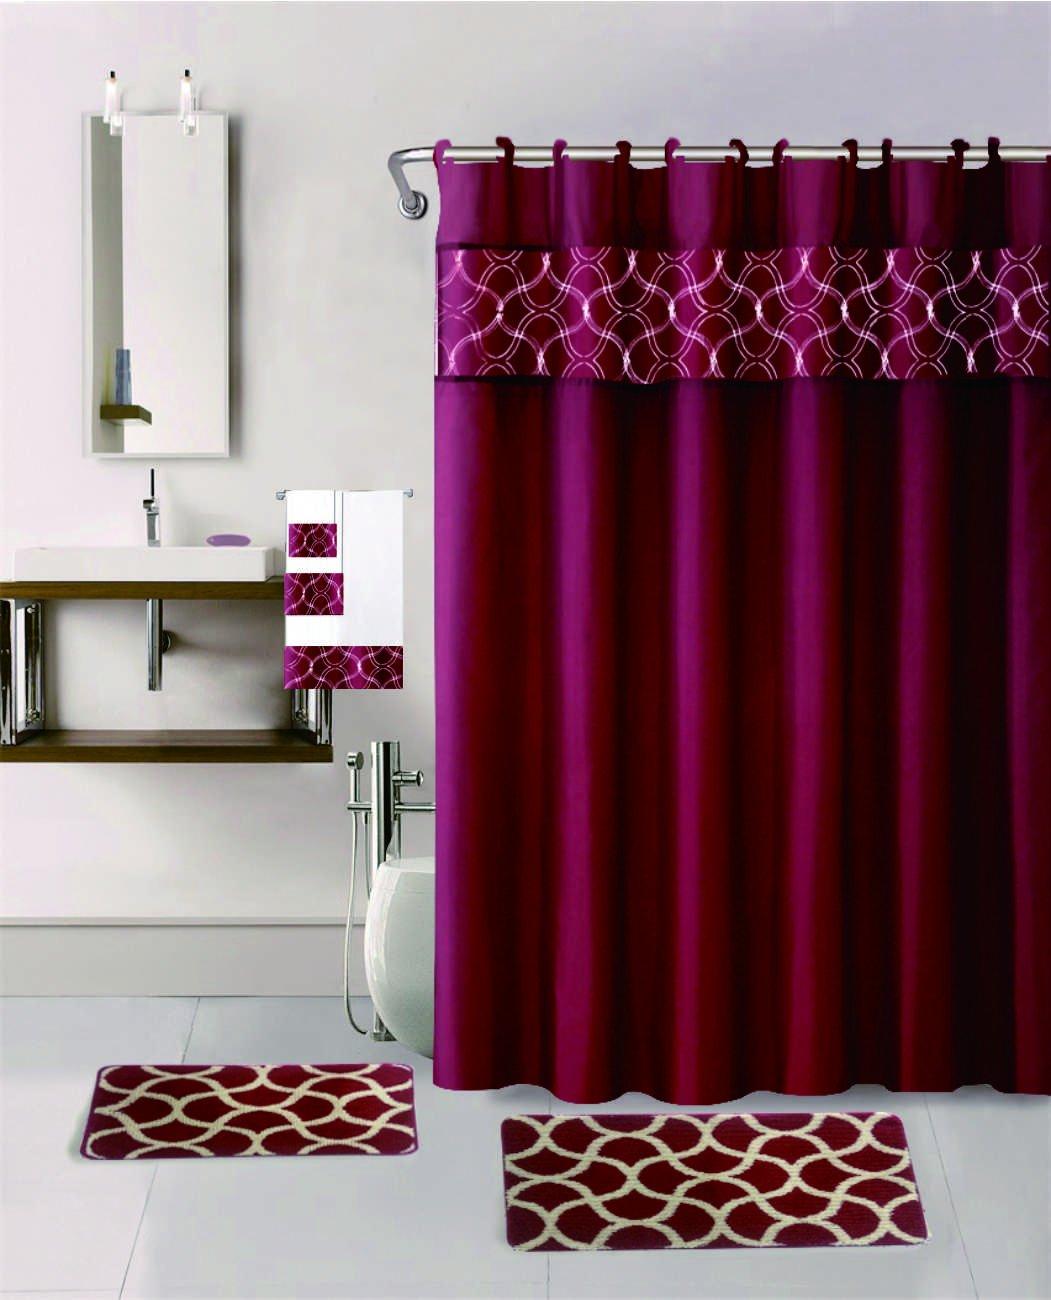 18 Pieces Sage Color Embroidery Geometric Design Bathroom Mats Set Non-slip Rug Carpet, Towels, Shower Curtain and Hooks GoldenLinens